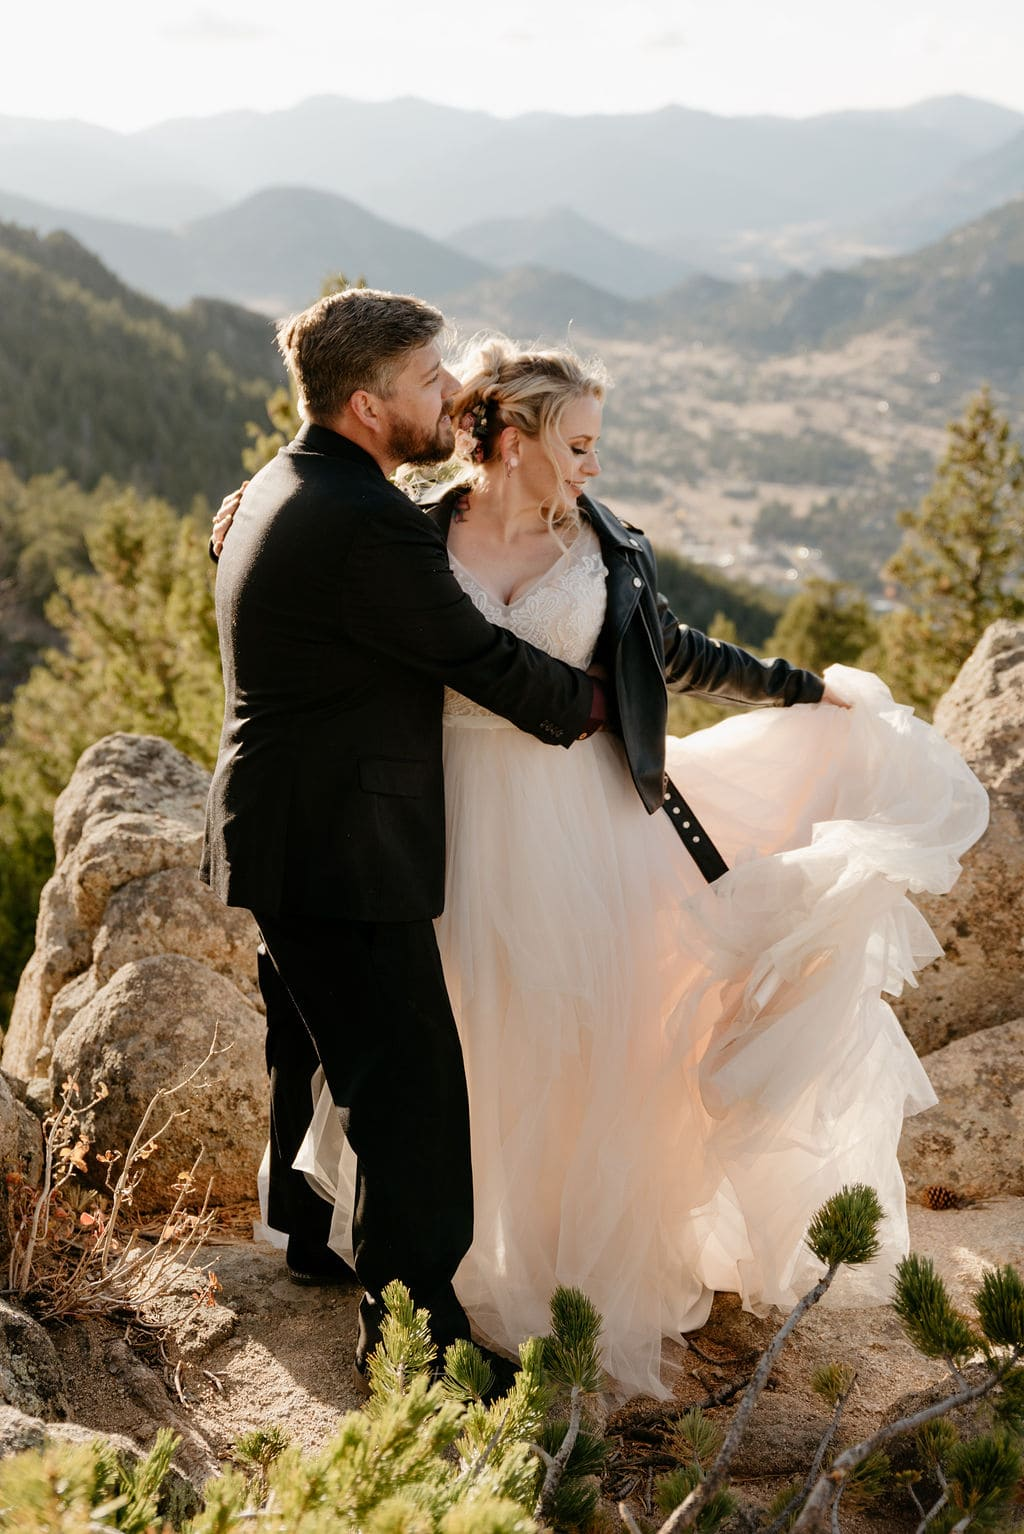 Golden Hour Wedding Portraits on Kruger Rock Overlook in Estes Park, Colorado